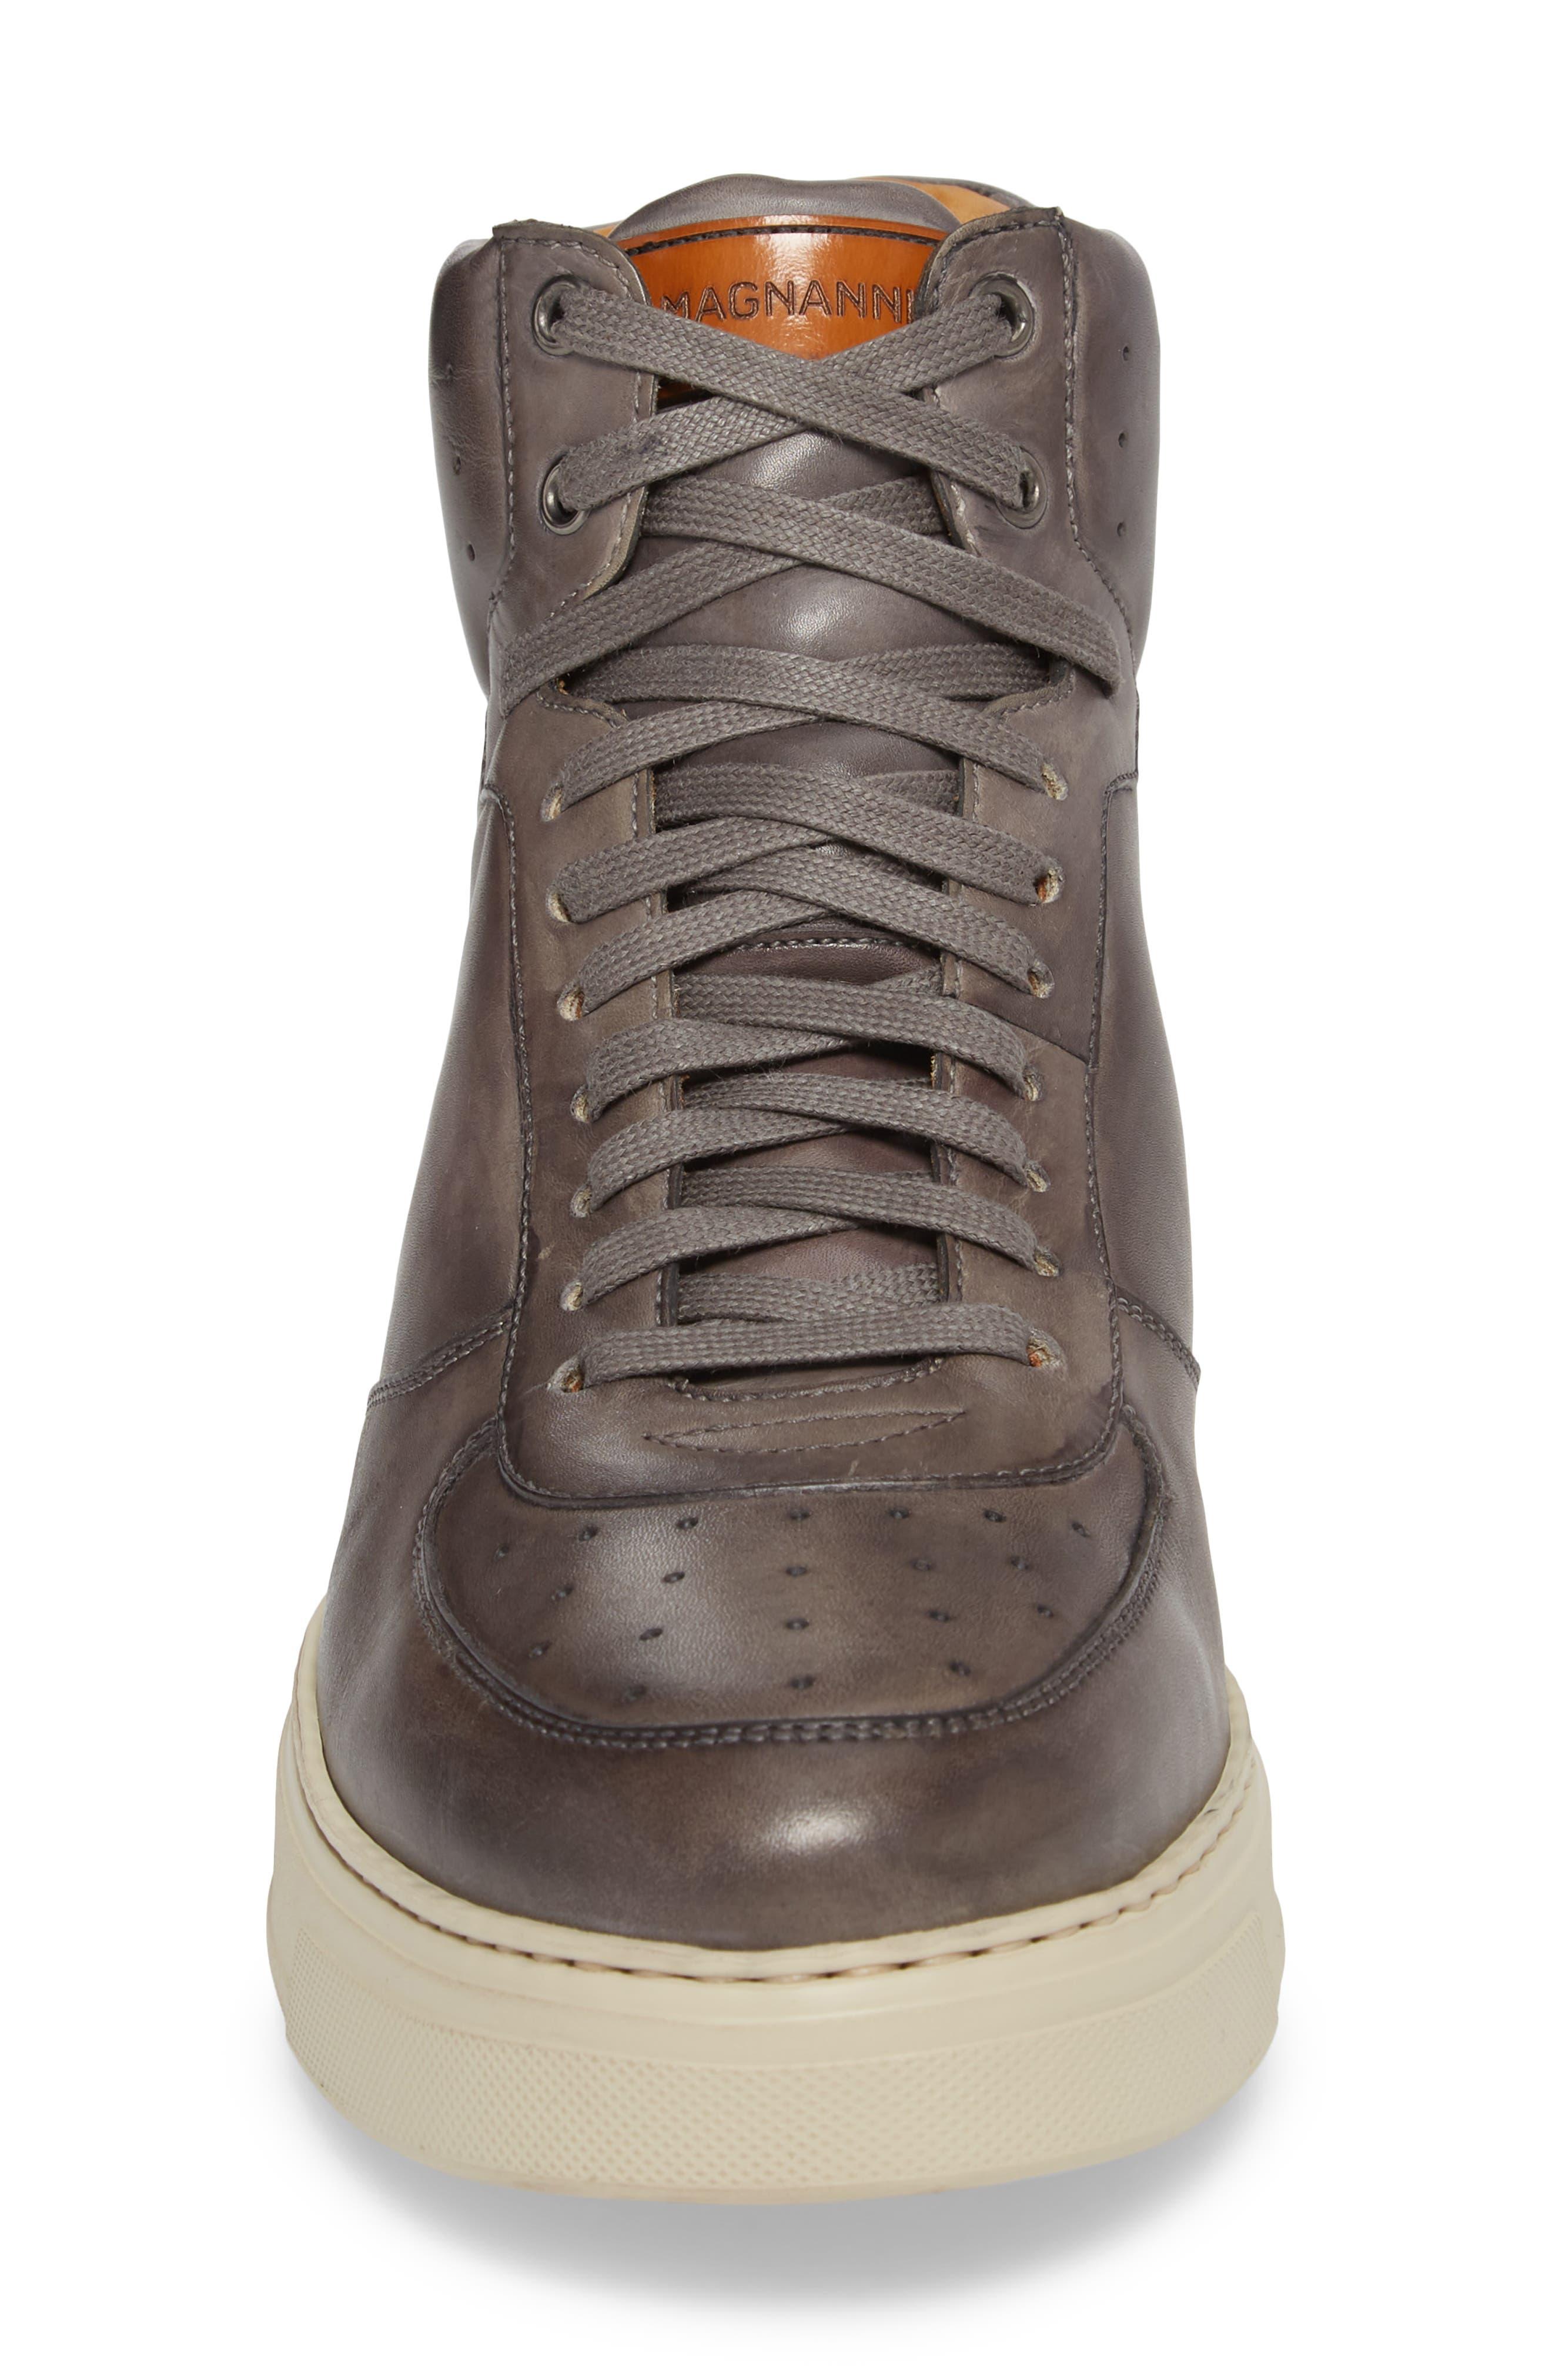 Varro Hi Top Lace Up Sneaker,                             Alternate thumbnail 4, color,                             021